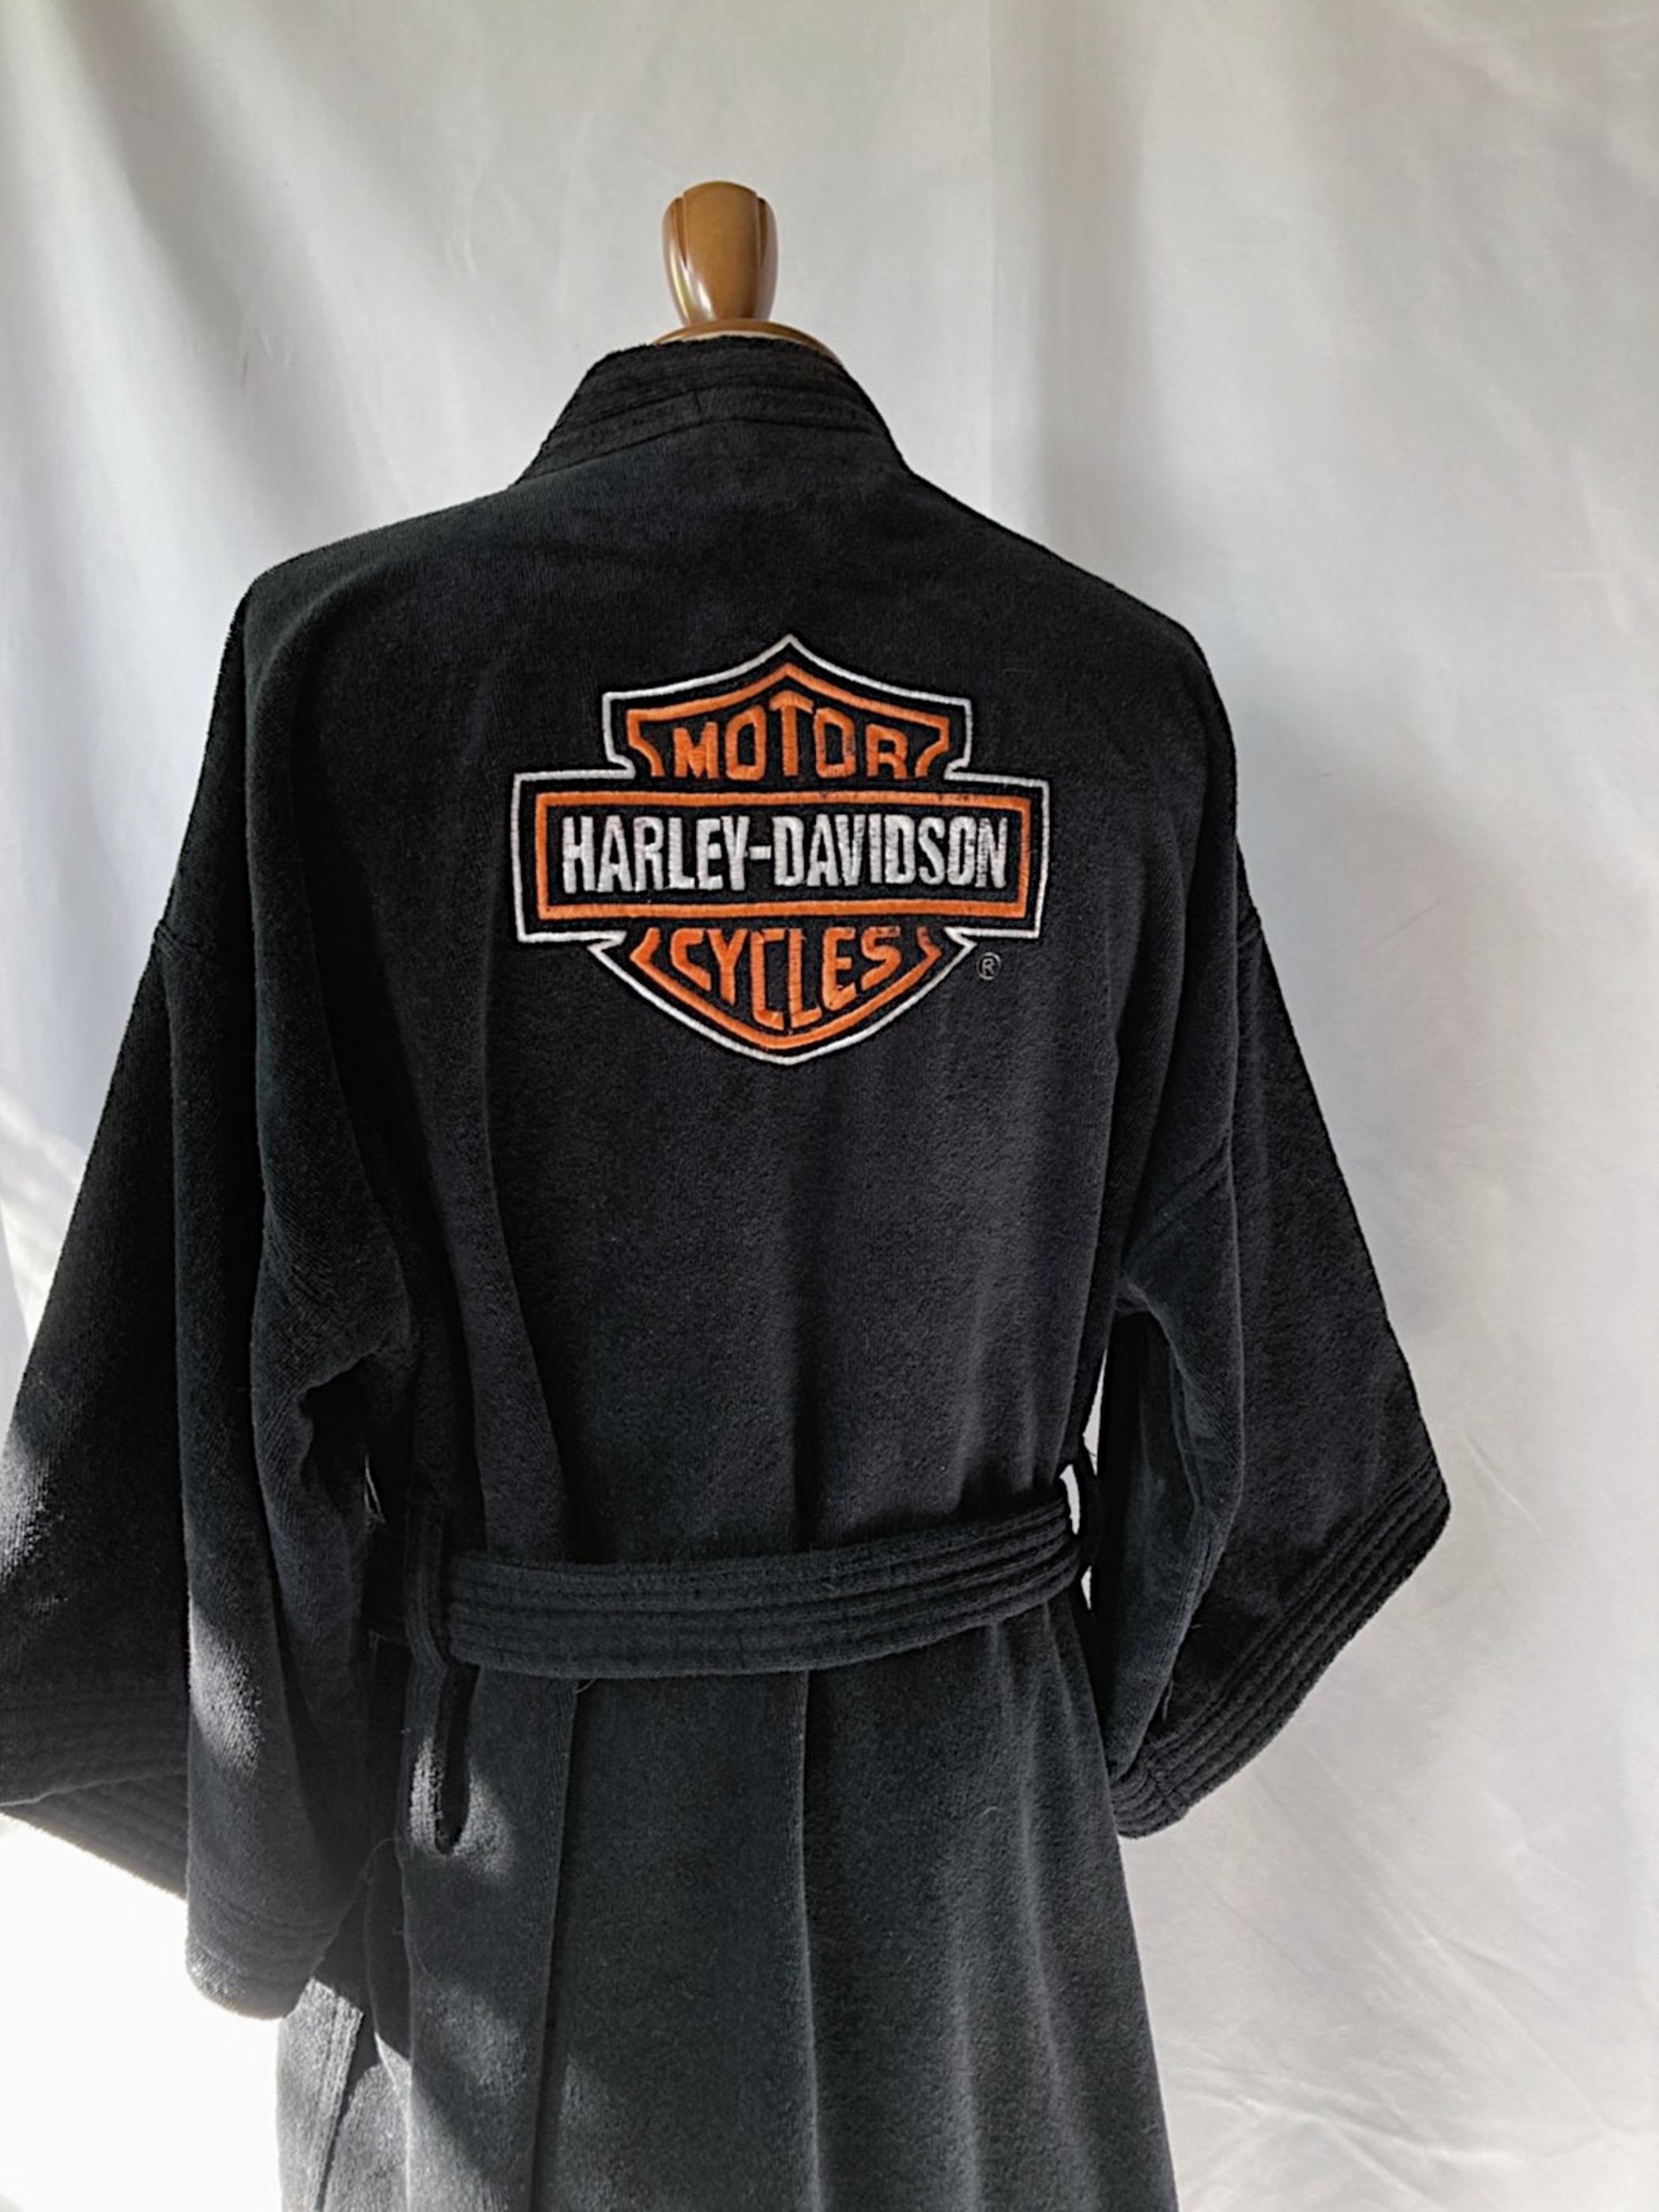 Harley-Davidson pile gown